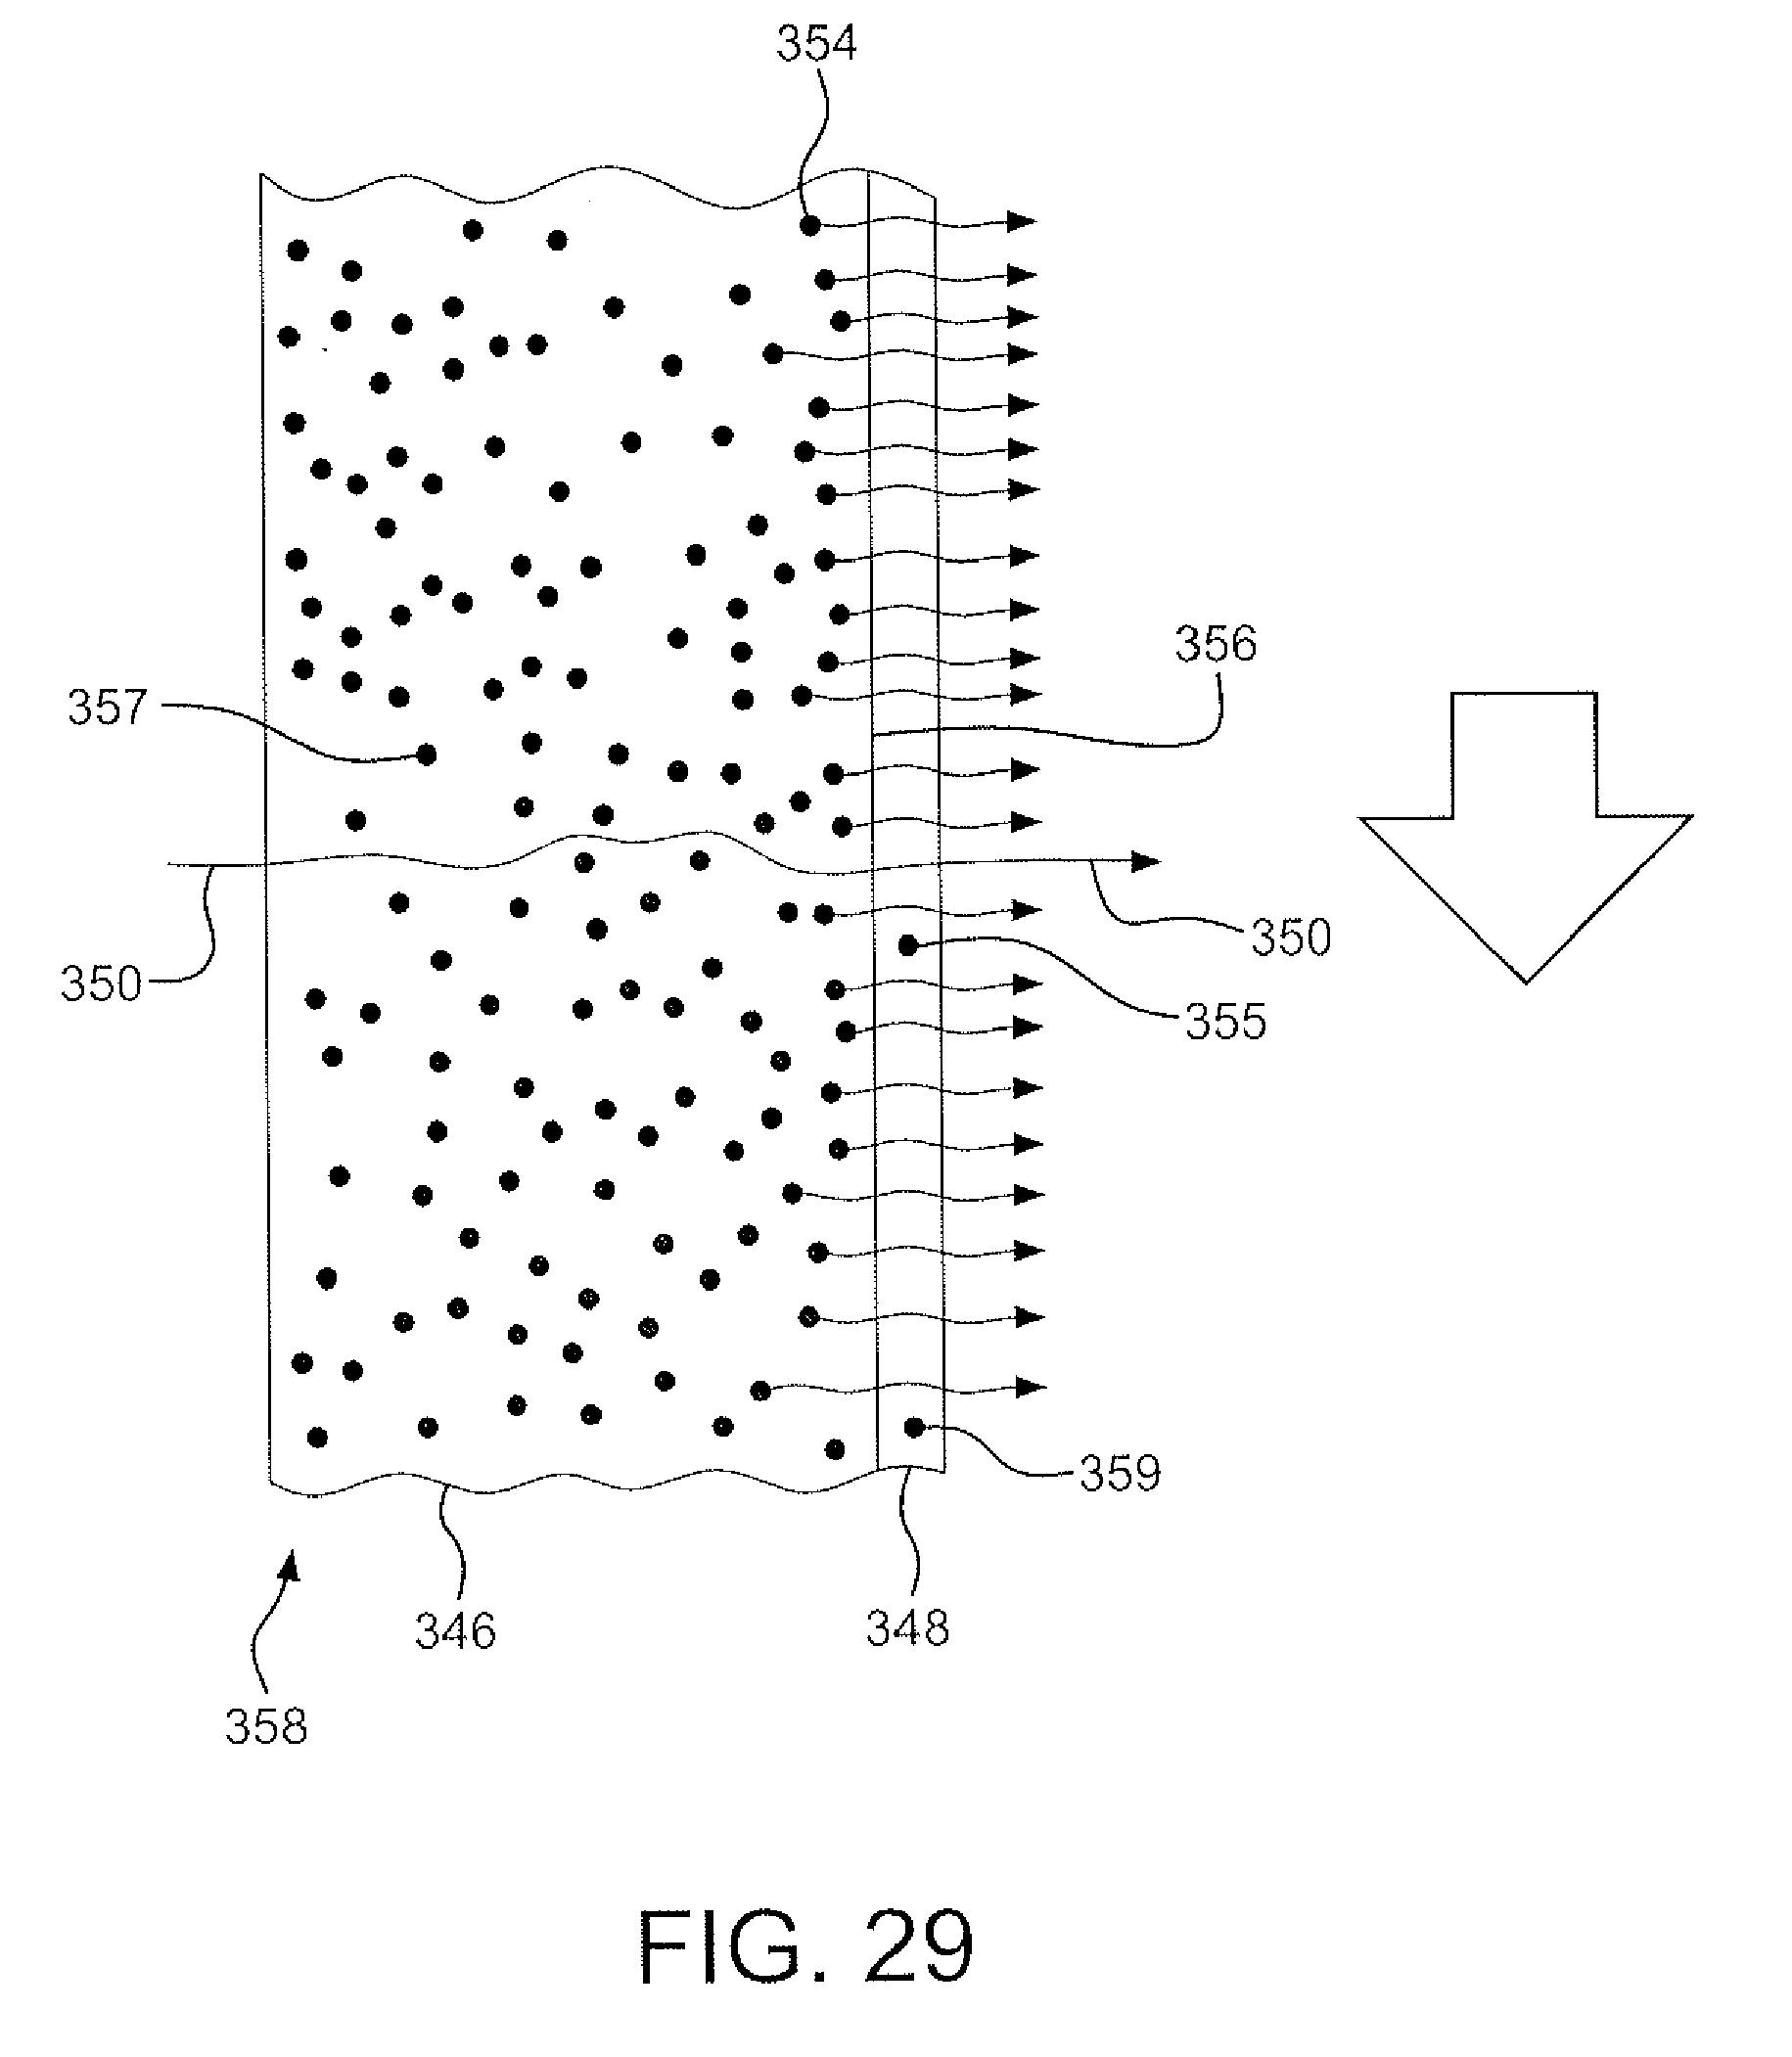 1994 Gmc Jimmy Fuse Box Diagram